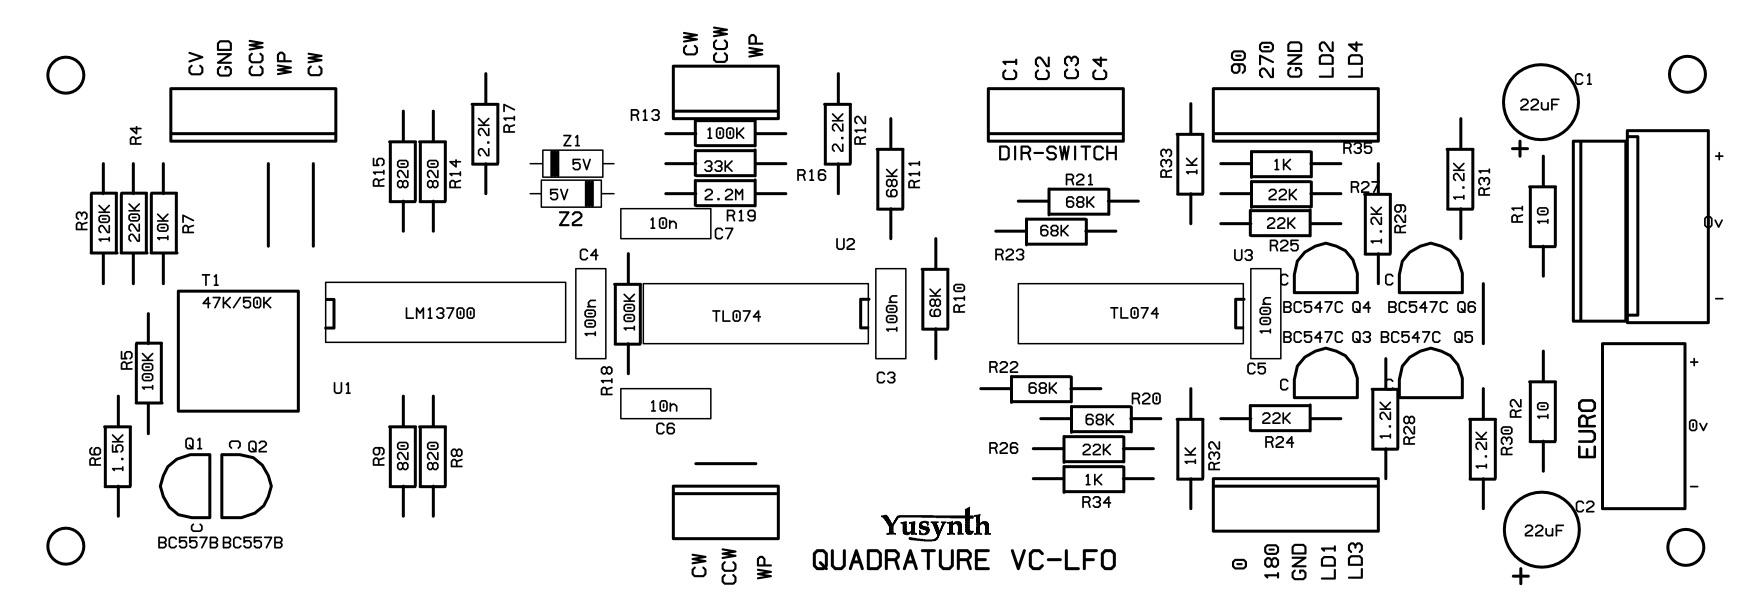 quadrature vclfo